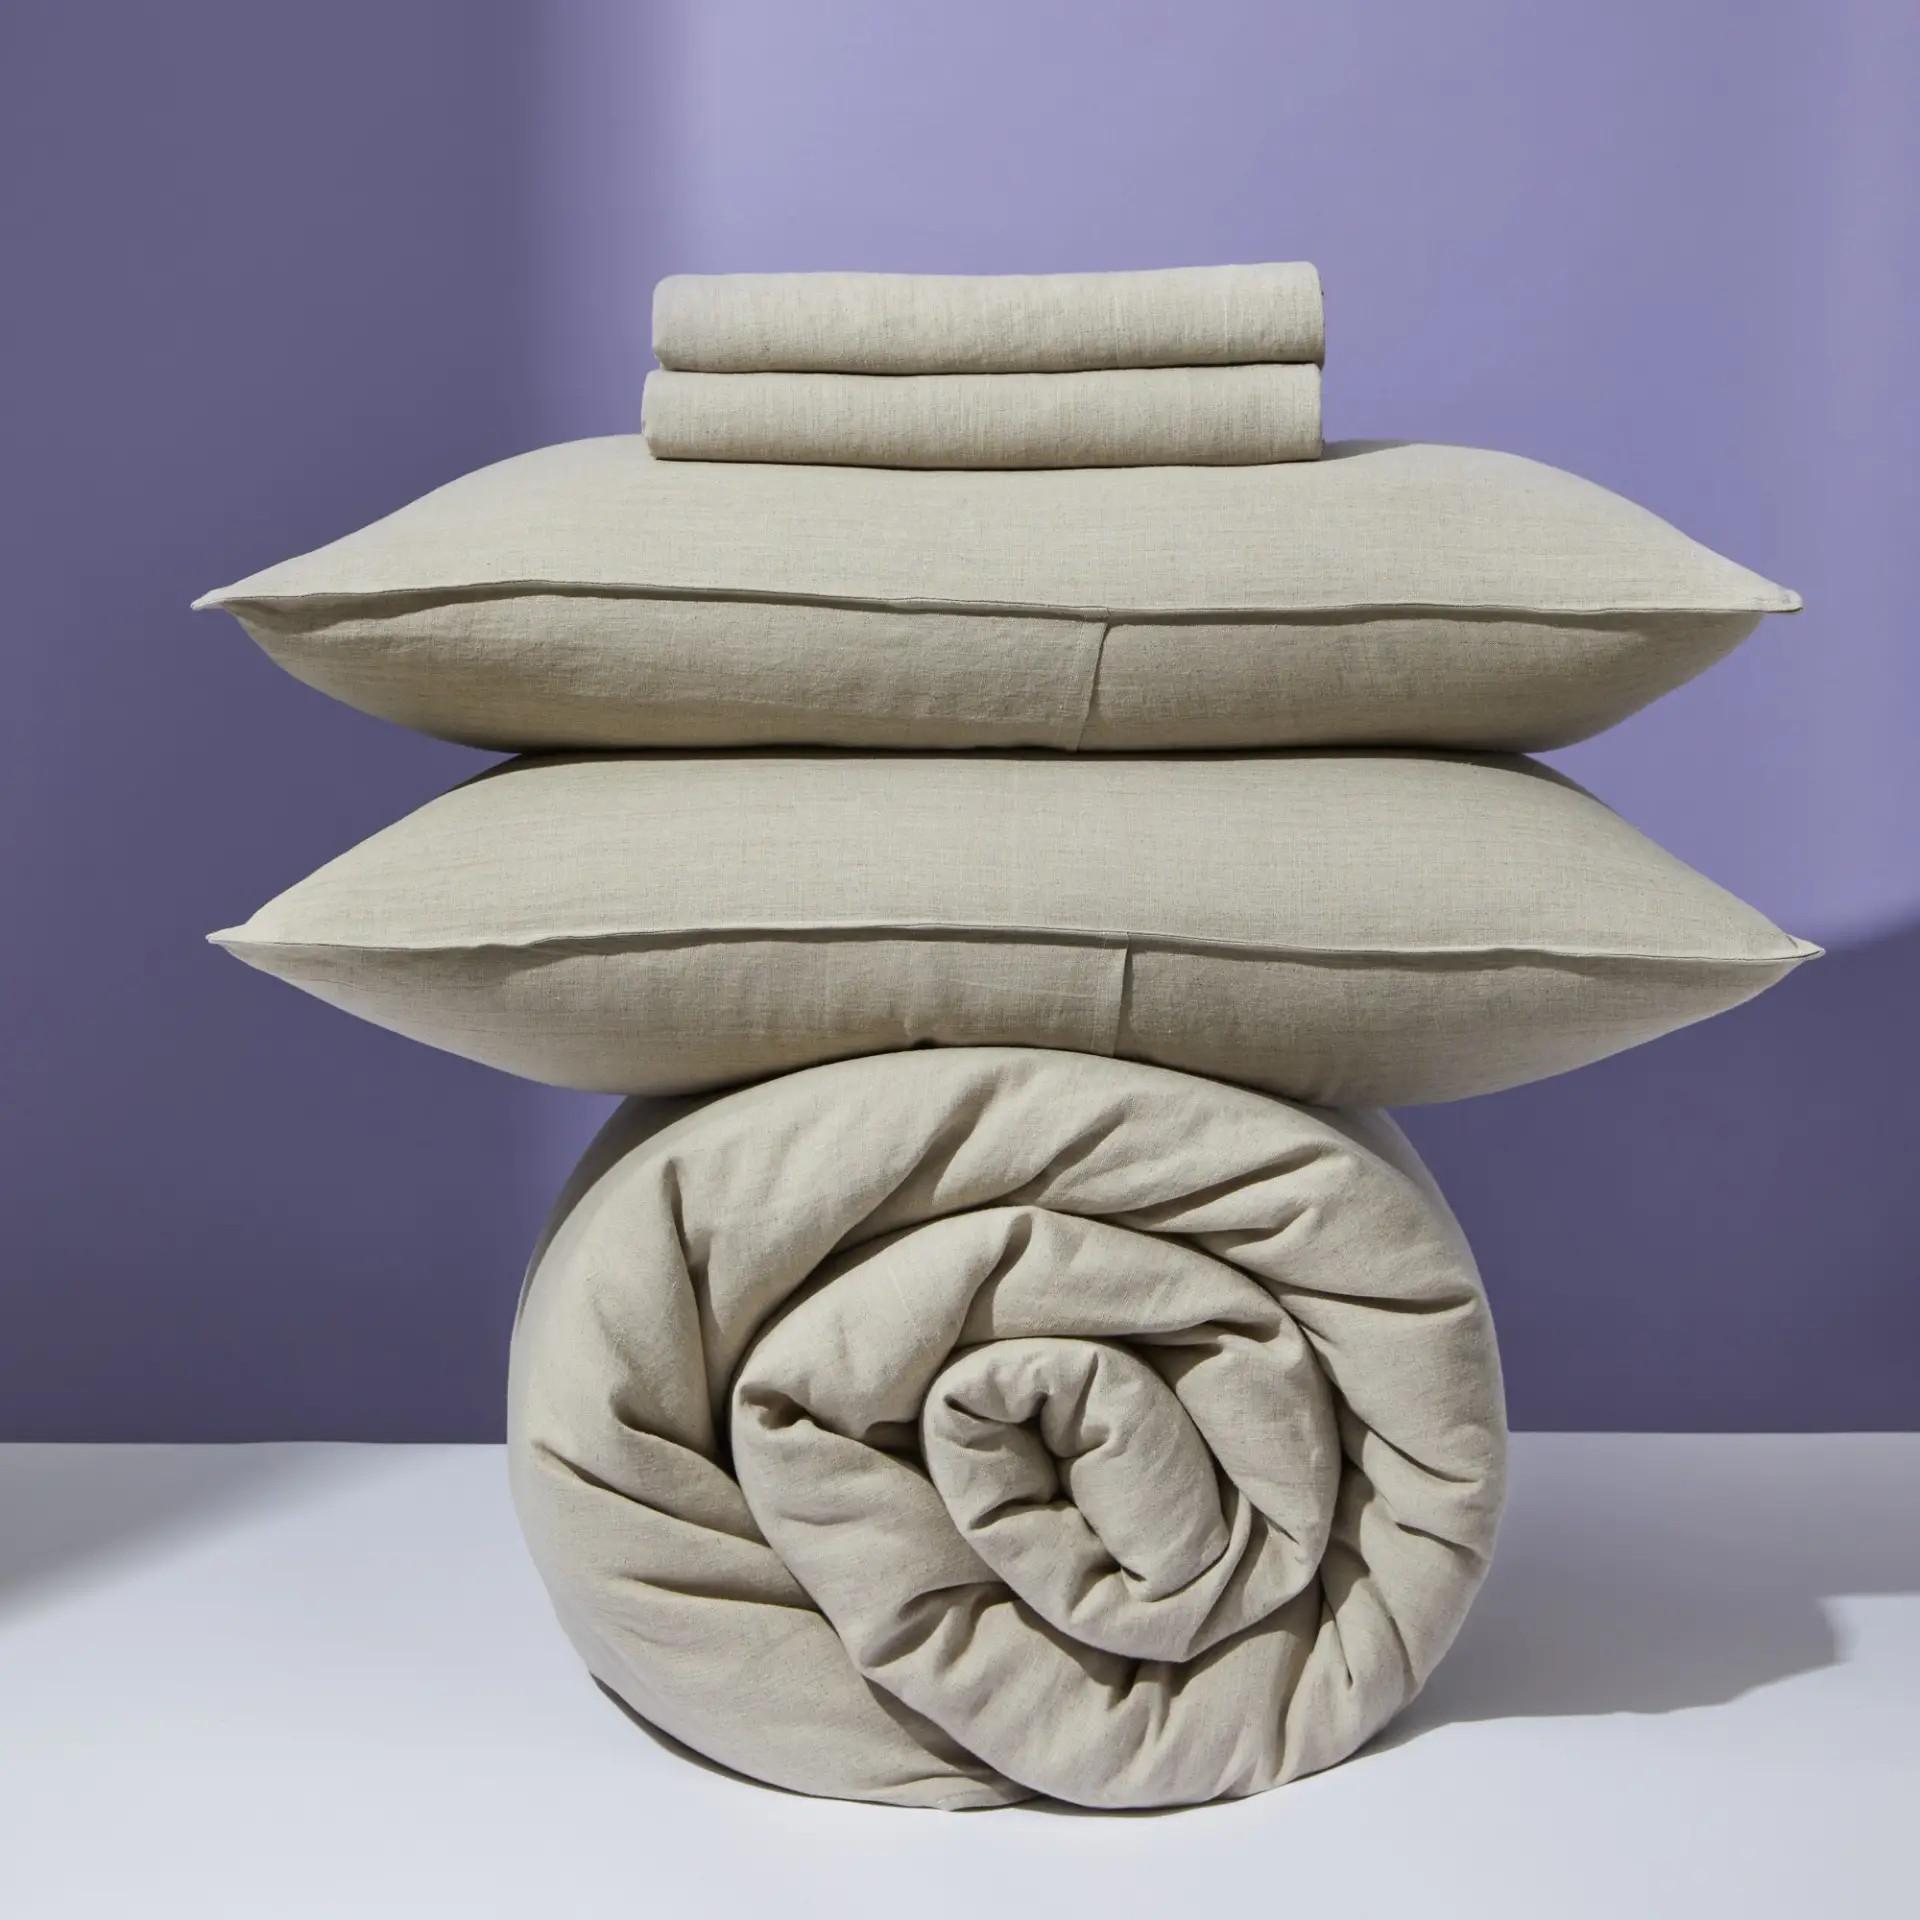 hemp bedding is more eco-friendly